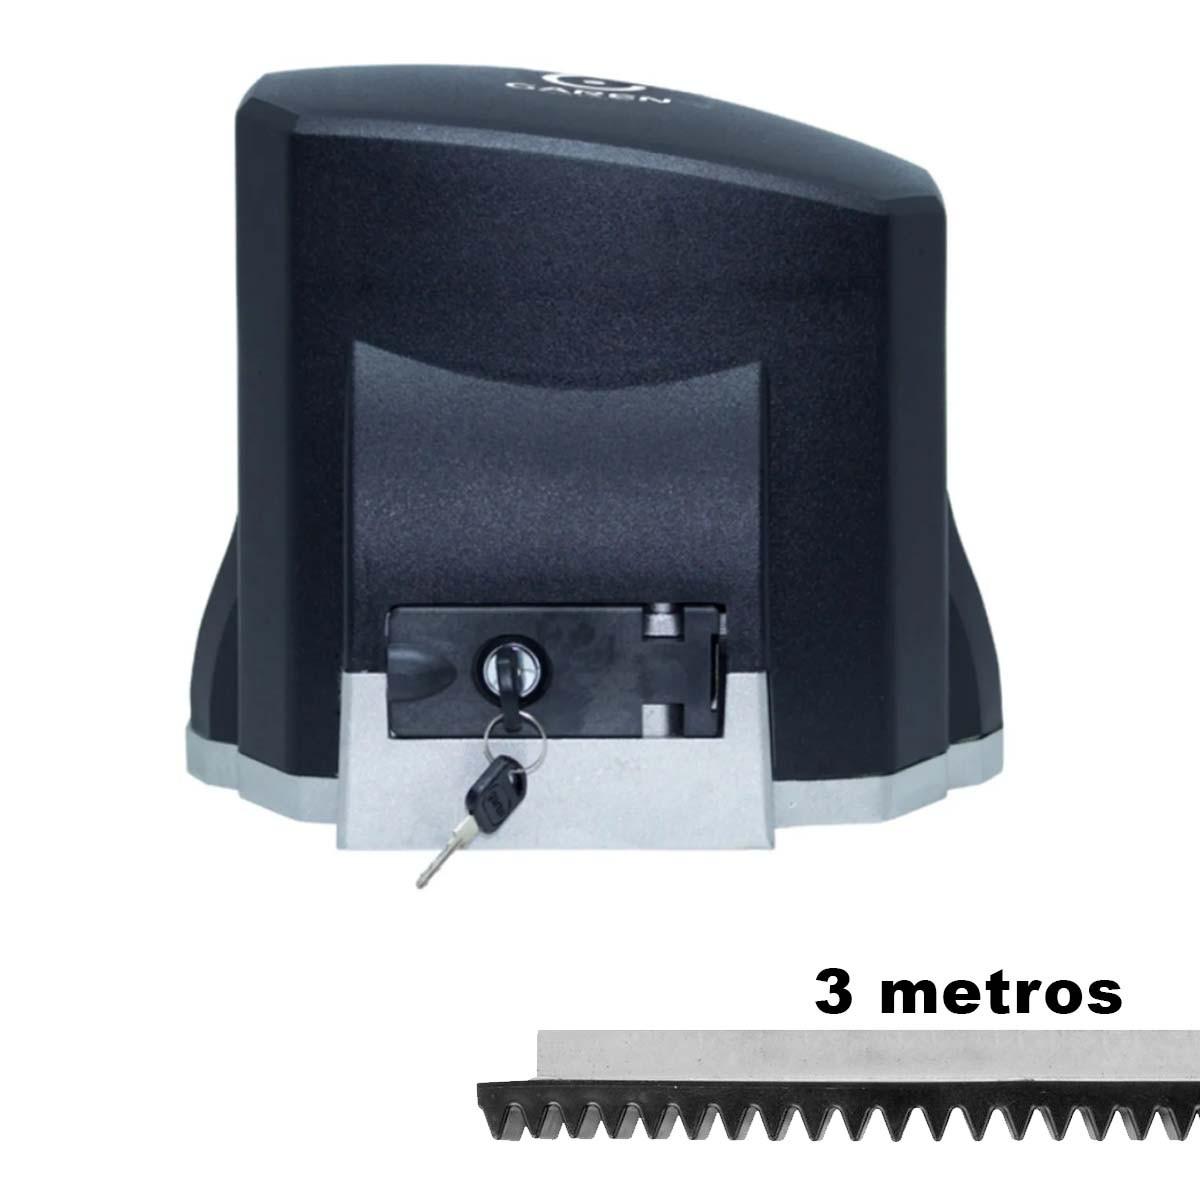 MOTOR DESLIZANTE GAREN 1/4 FIT 220V + 03 METROS CREMALHEIRA